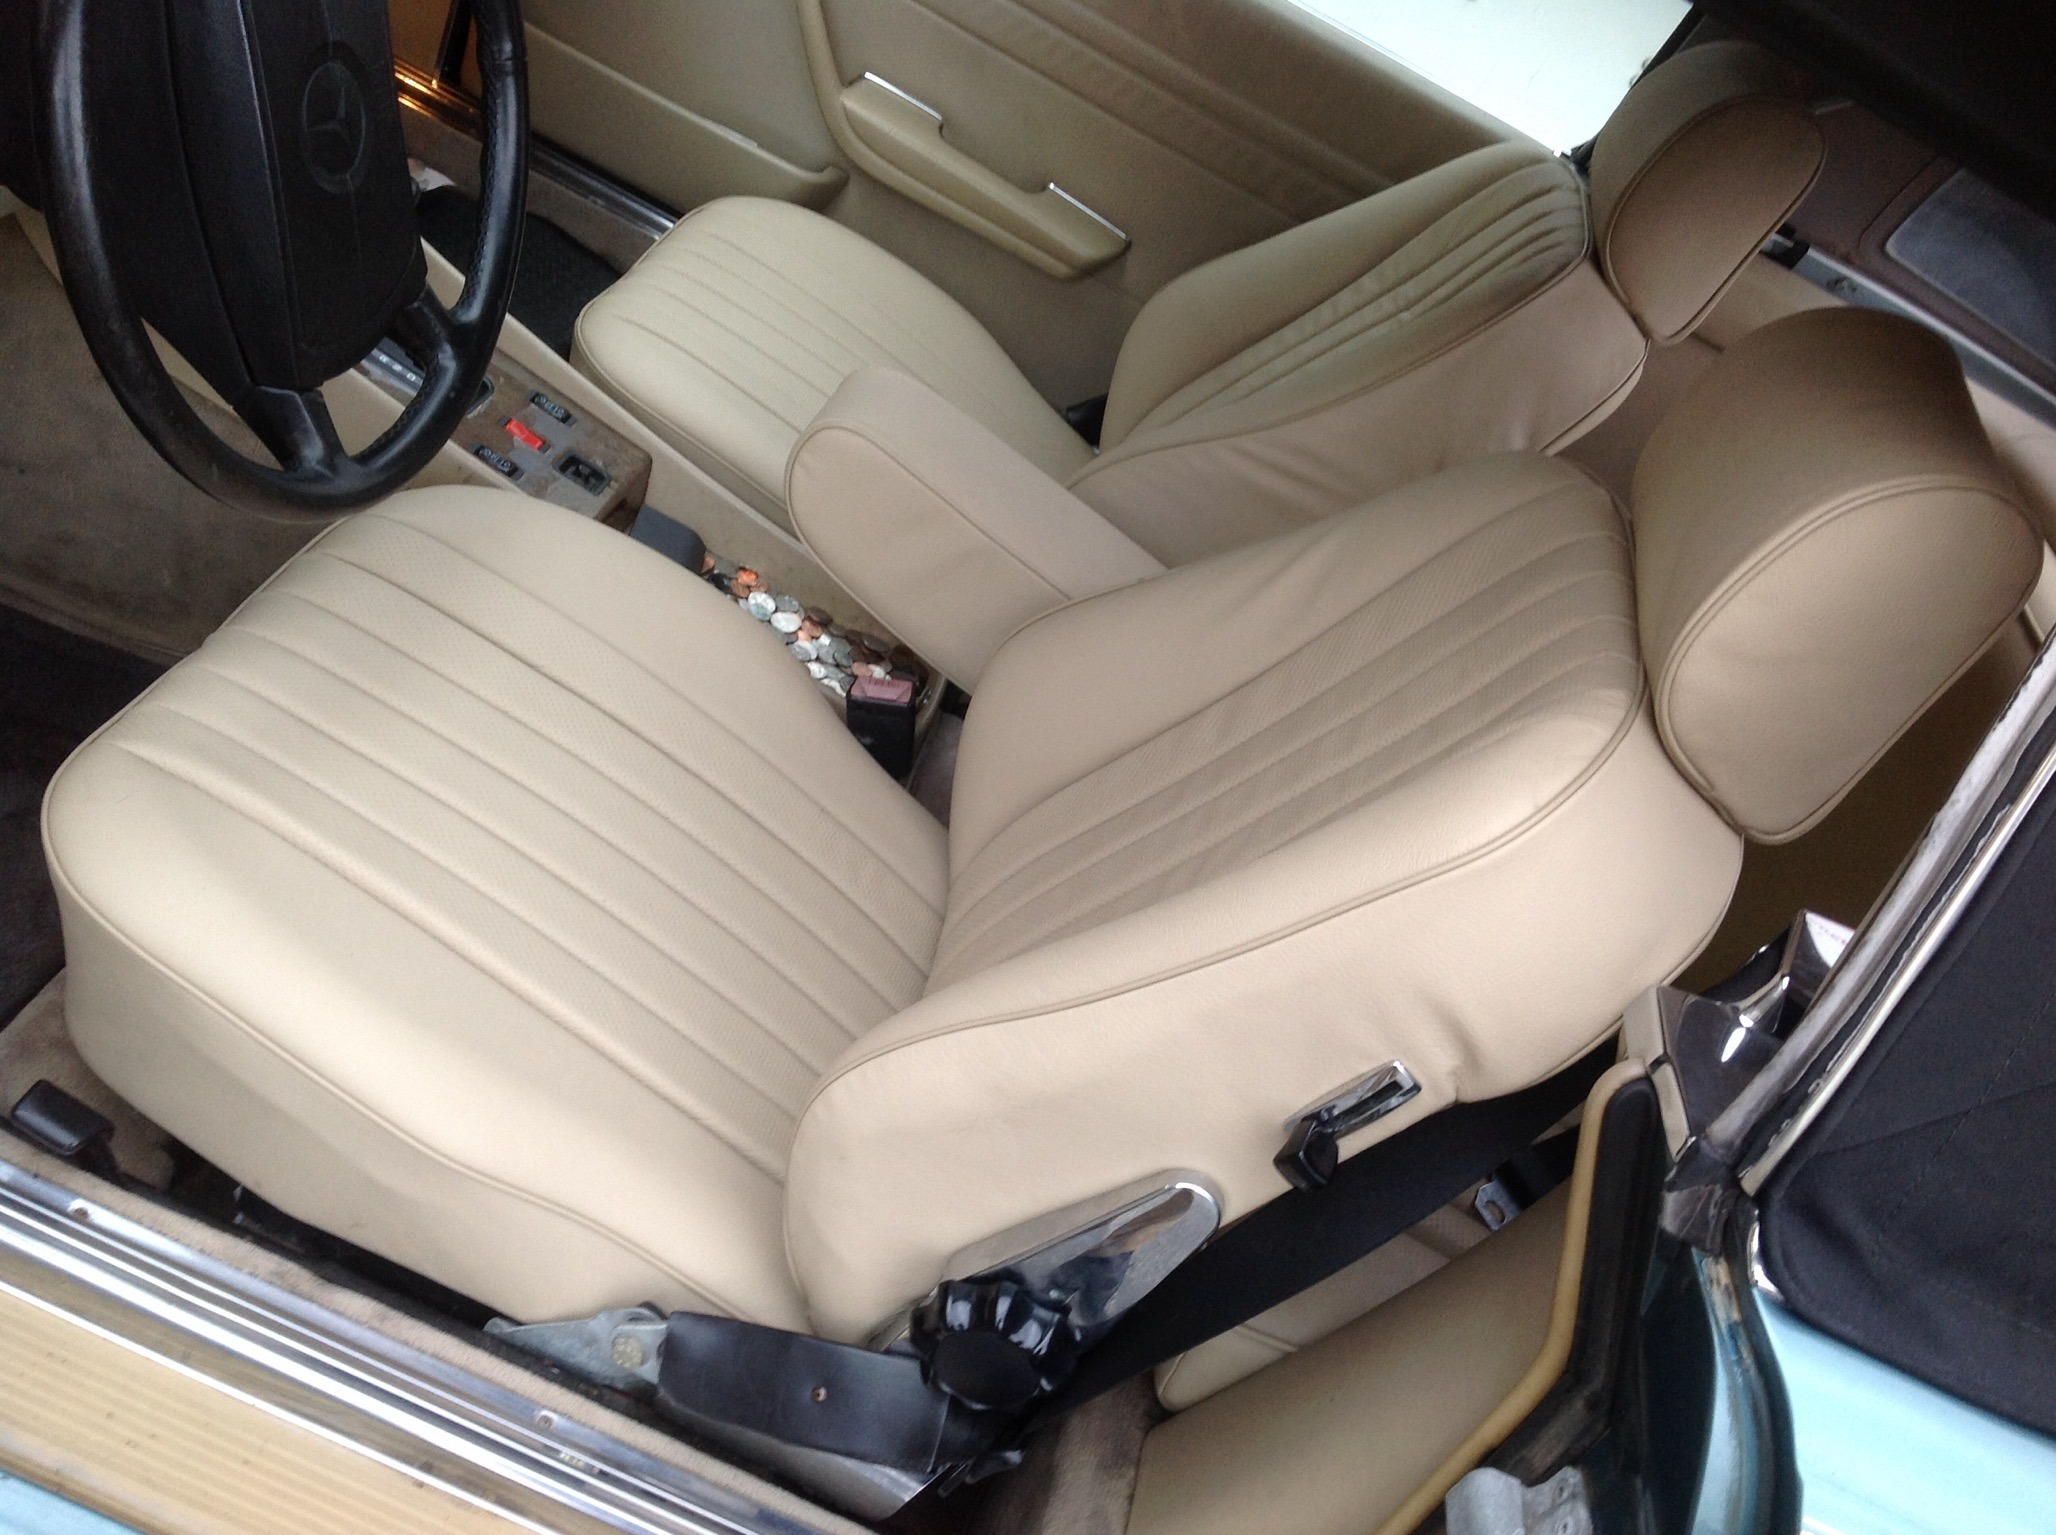 Mercedrs Benz seat